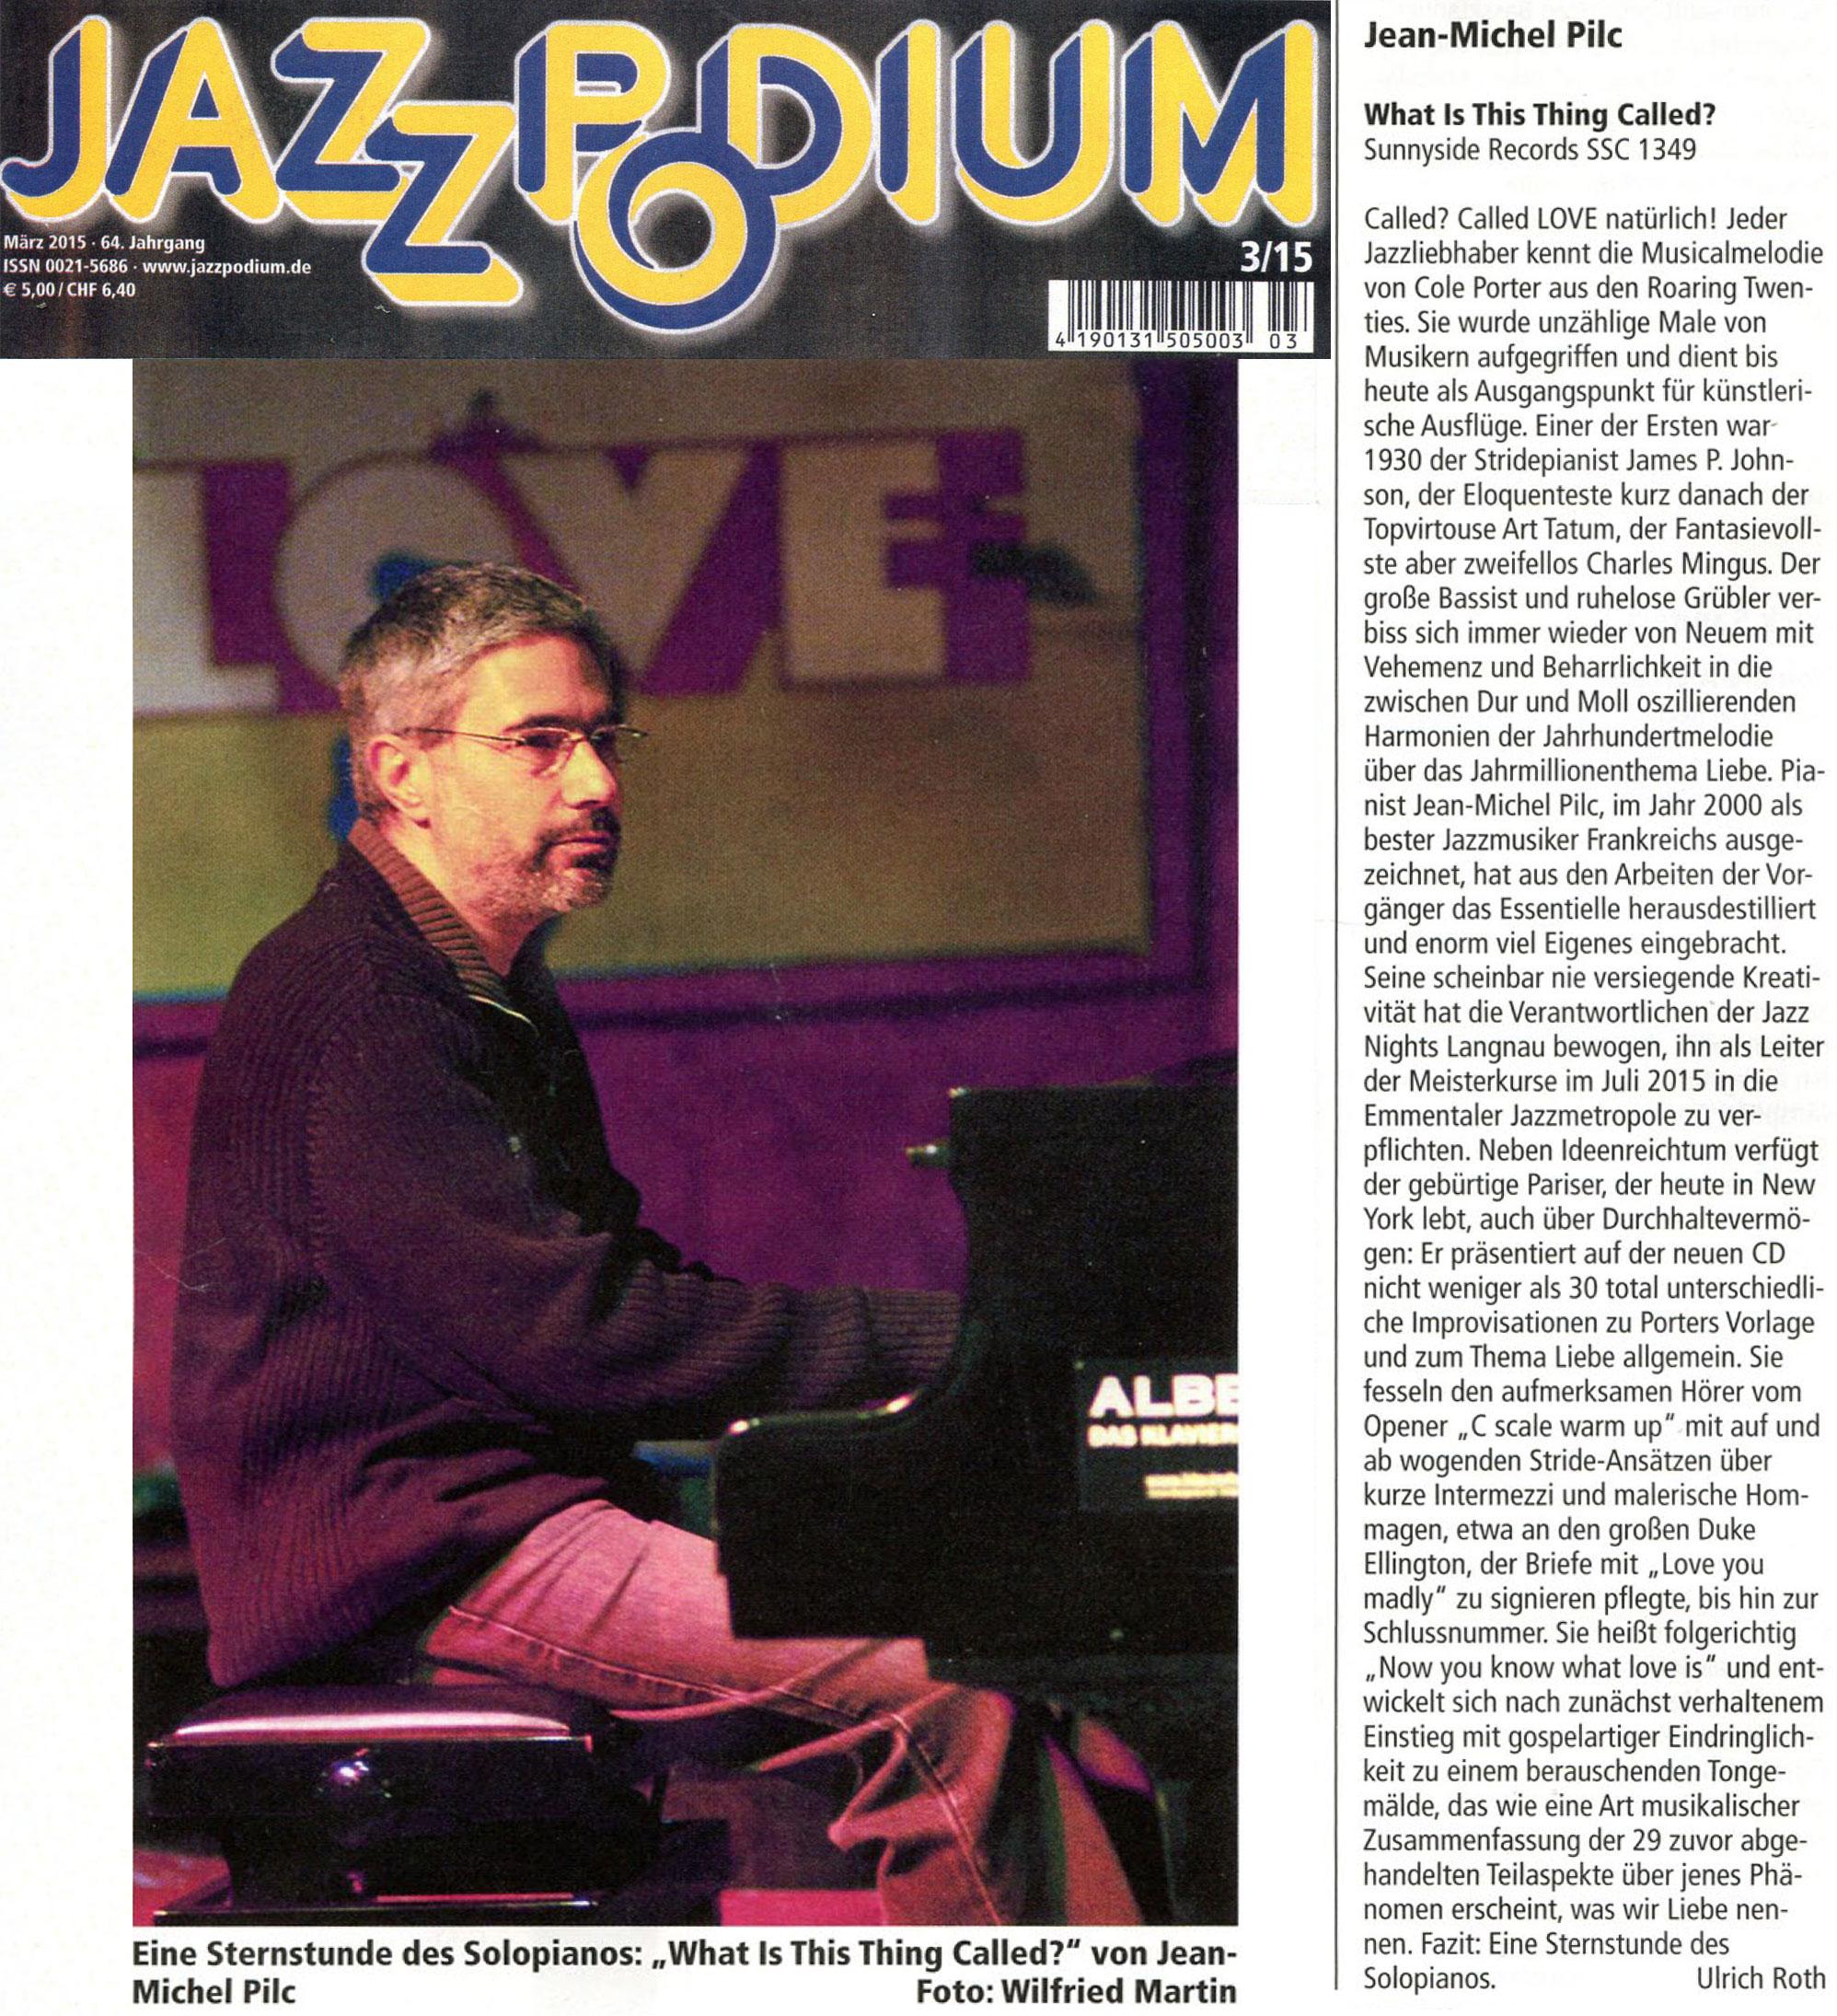 Jean-MichelPilc_JazzPodium